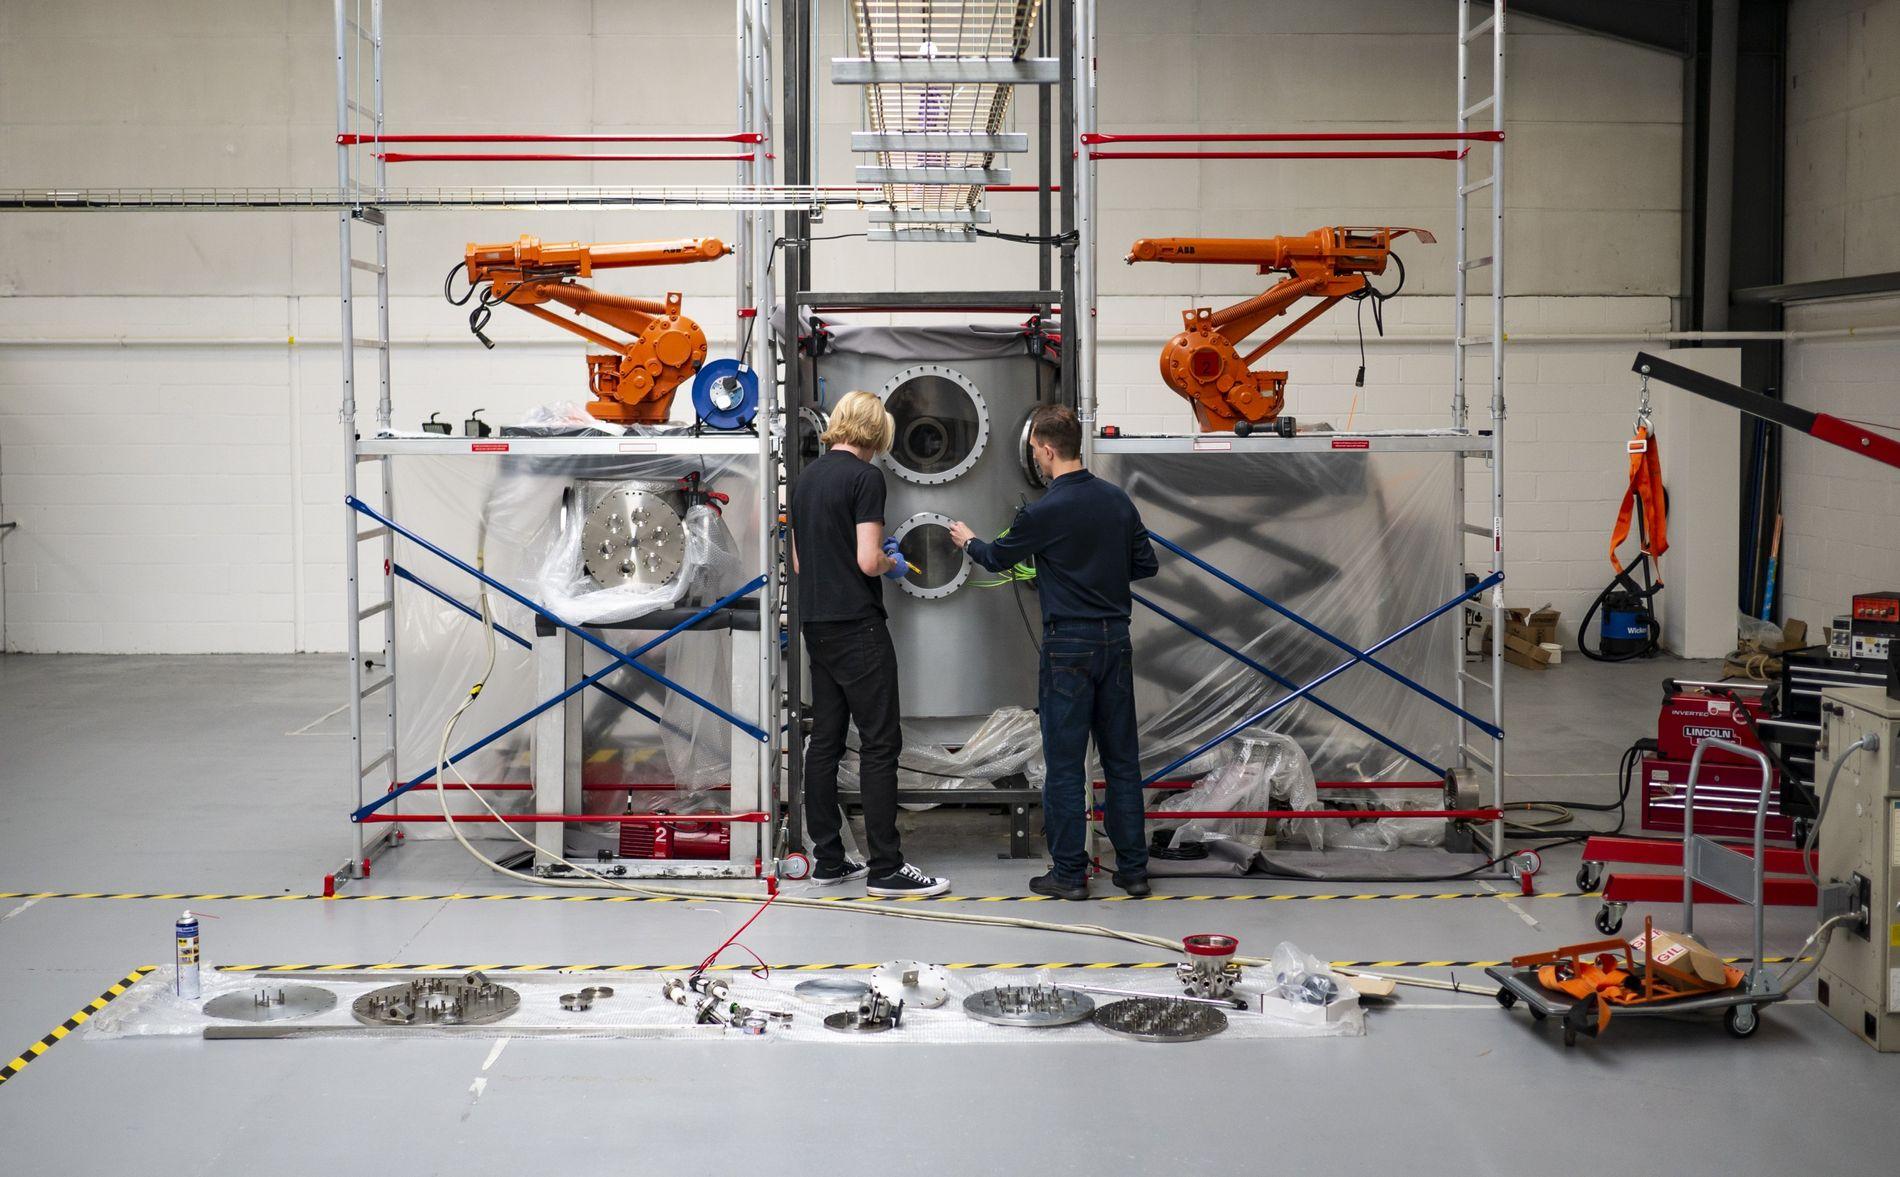 Richard Dinan and Dr James Lambert at work at Pulsar Fusion, Milton Keynes, August 2019.